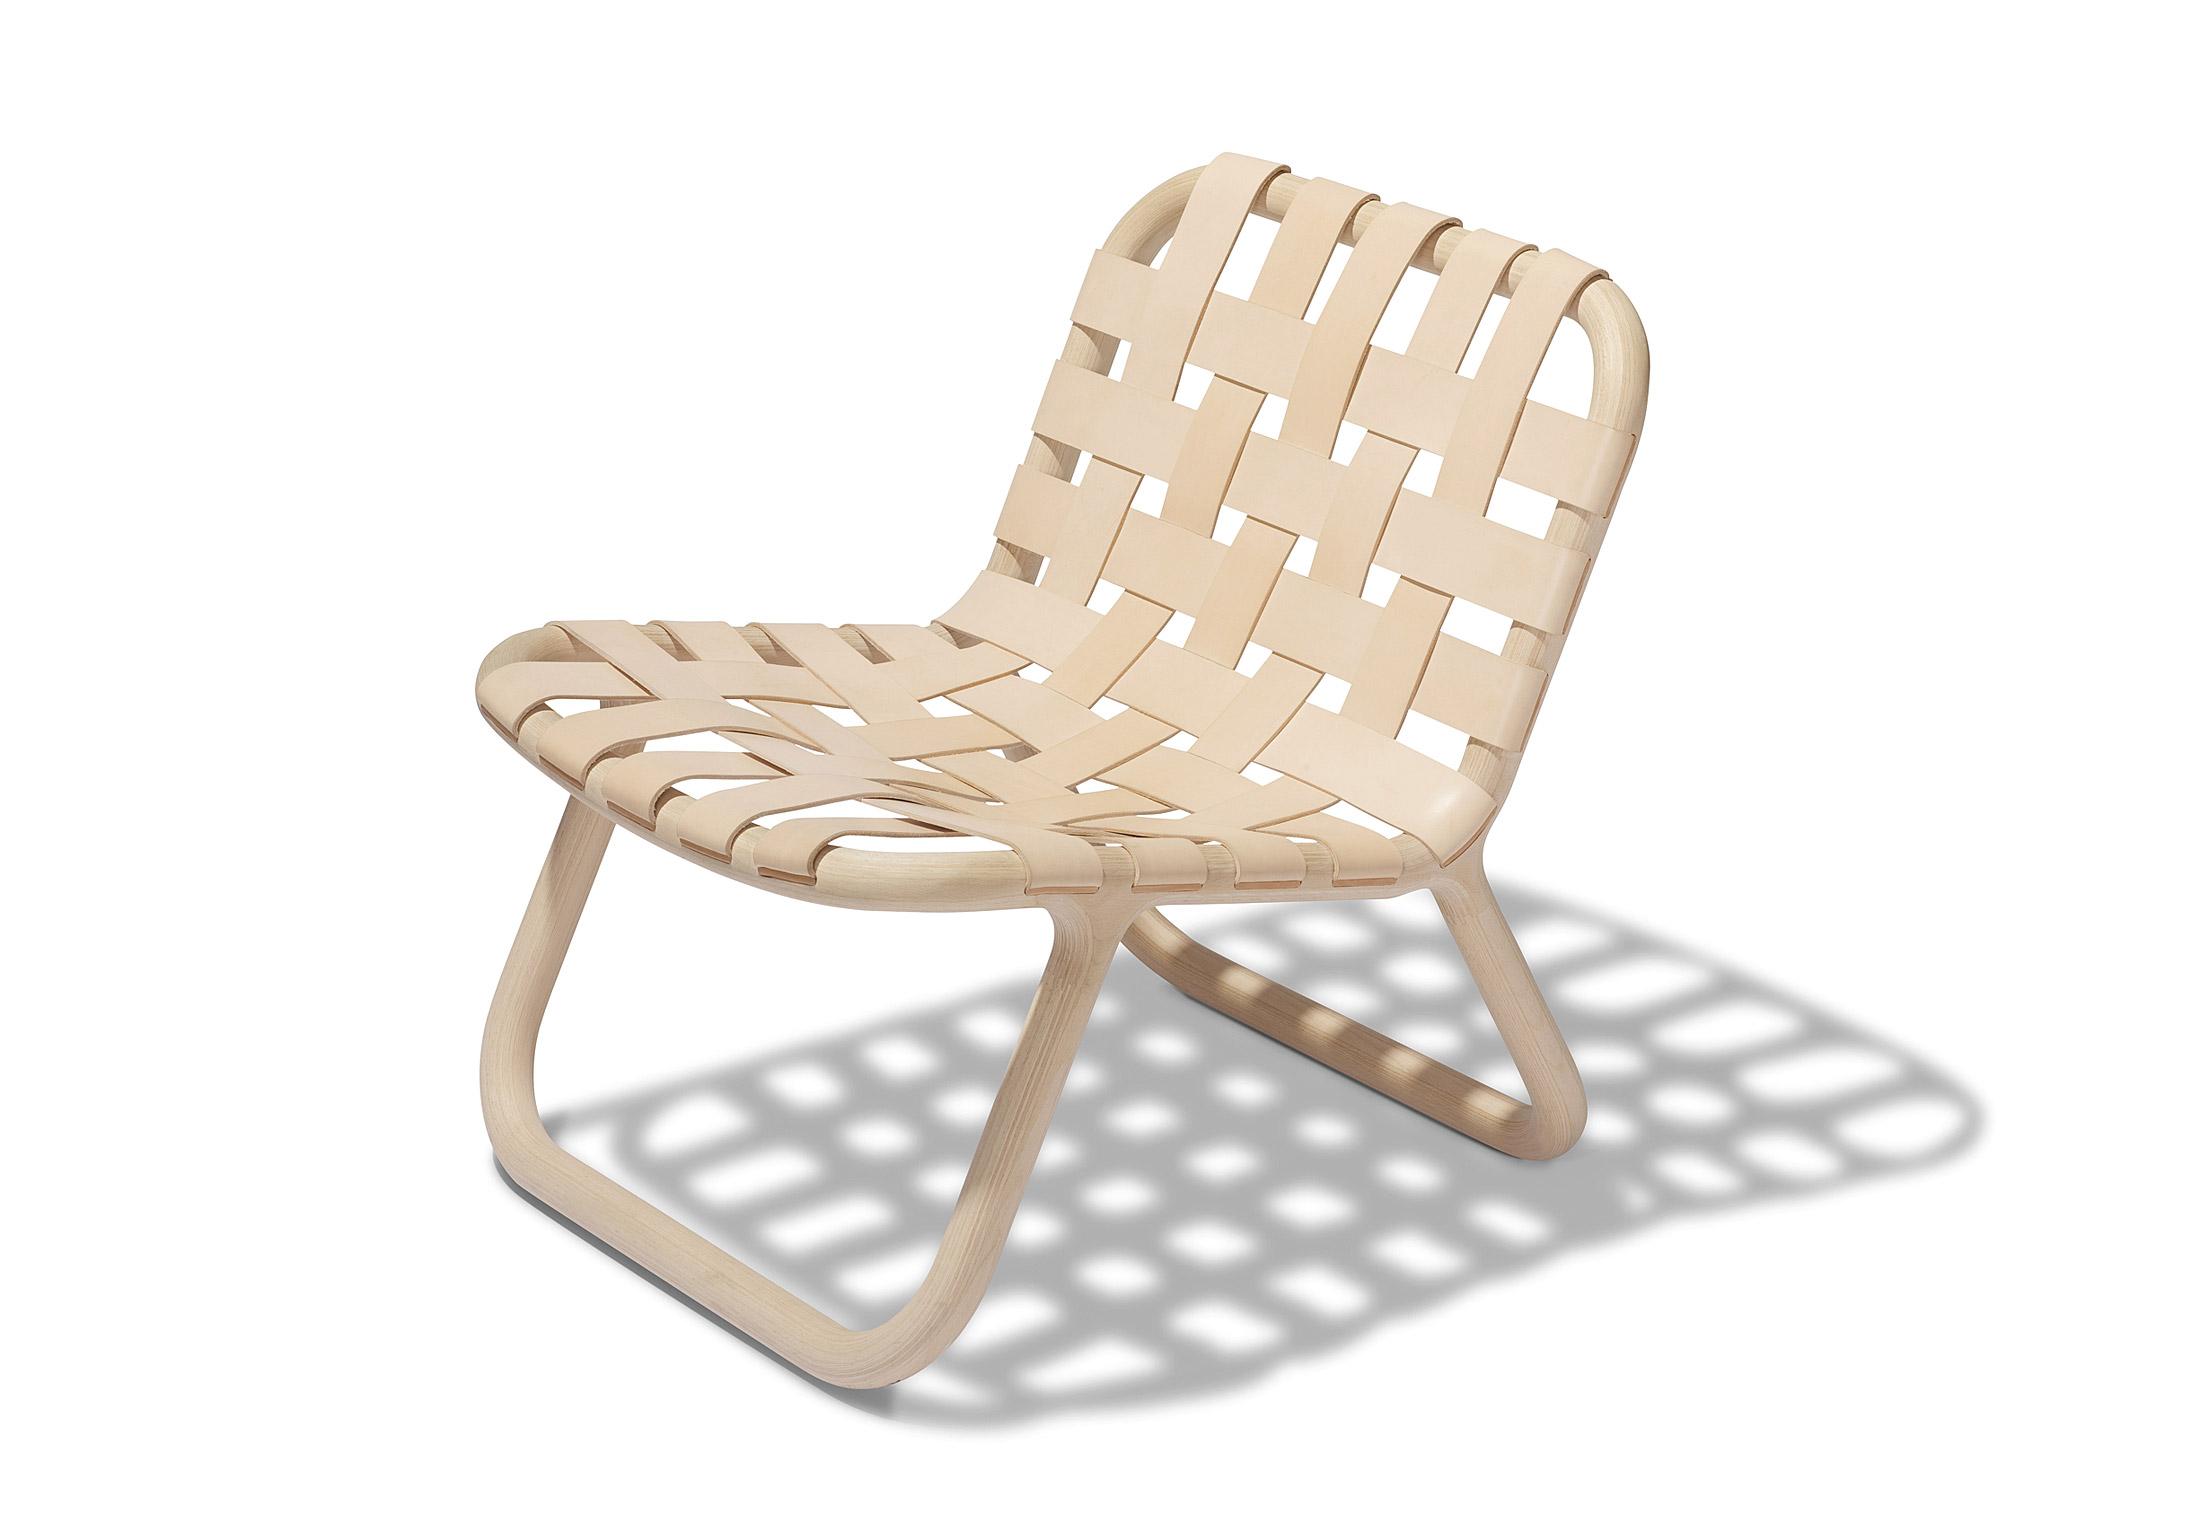 camping stuhl von normann copenhagen stylepark. Black Bedroom Furniture Sets. Home Design Ideas